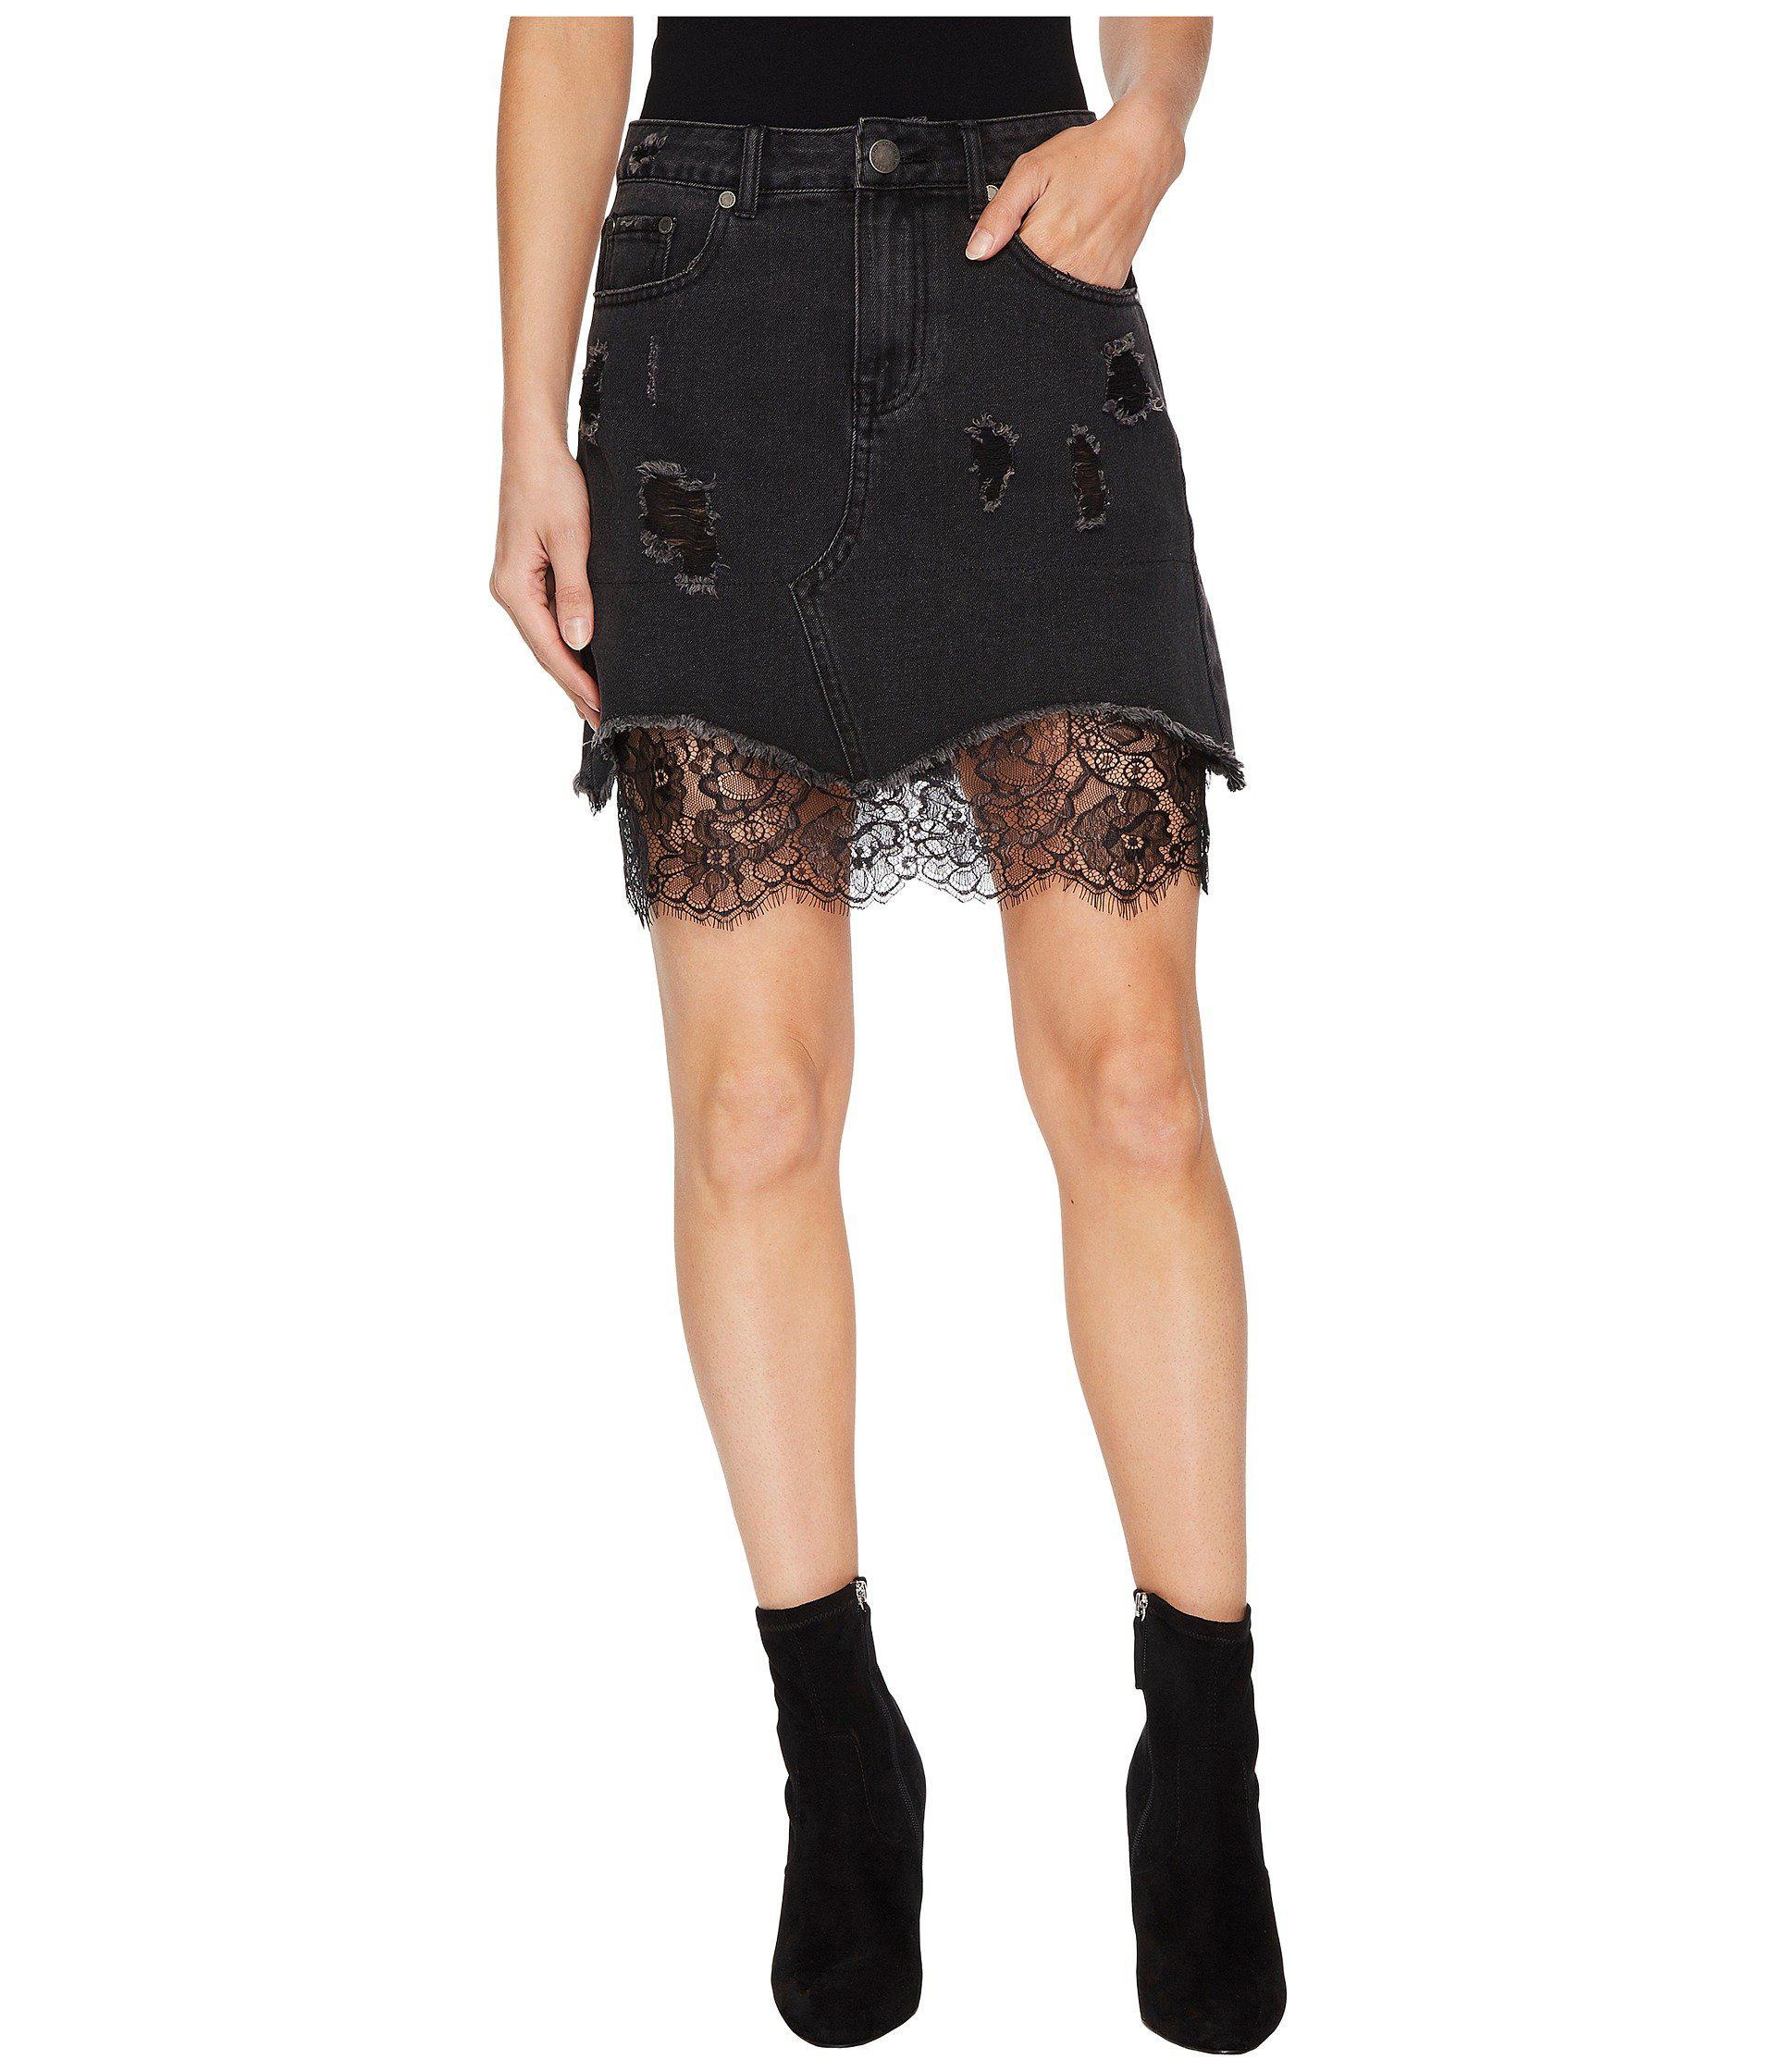 198cc1a58b9e Black Distressed Denim Mini Skirt   Saddha